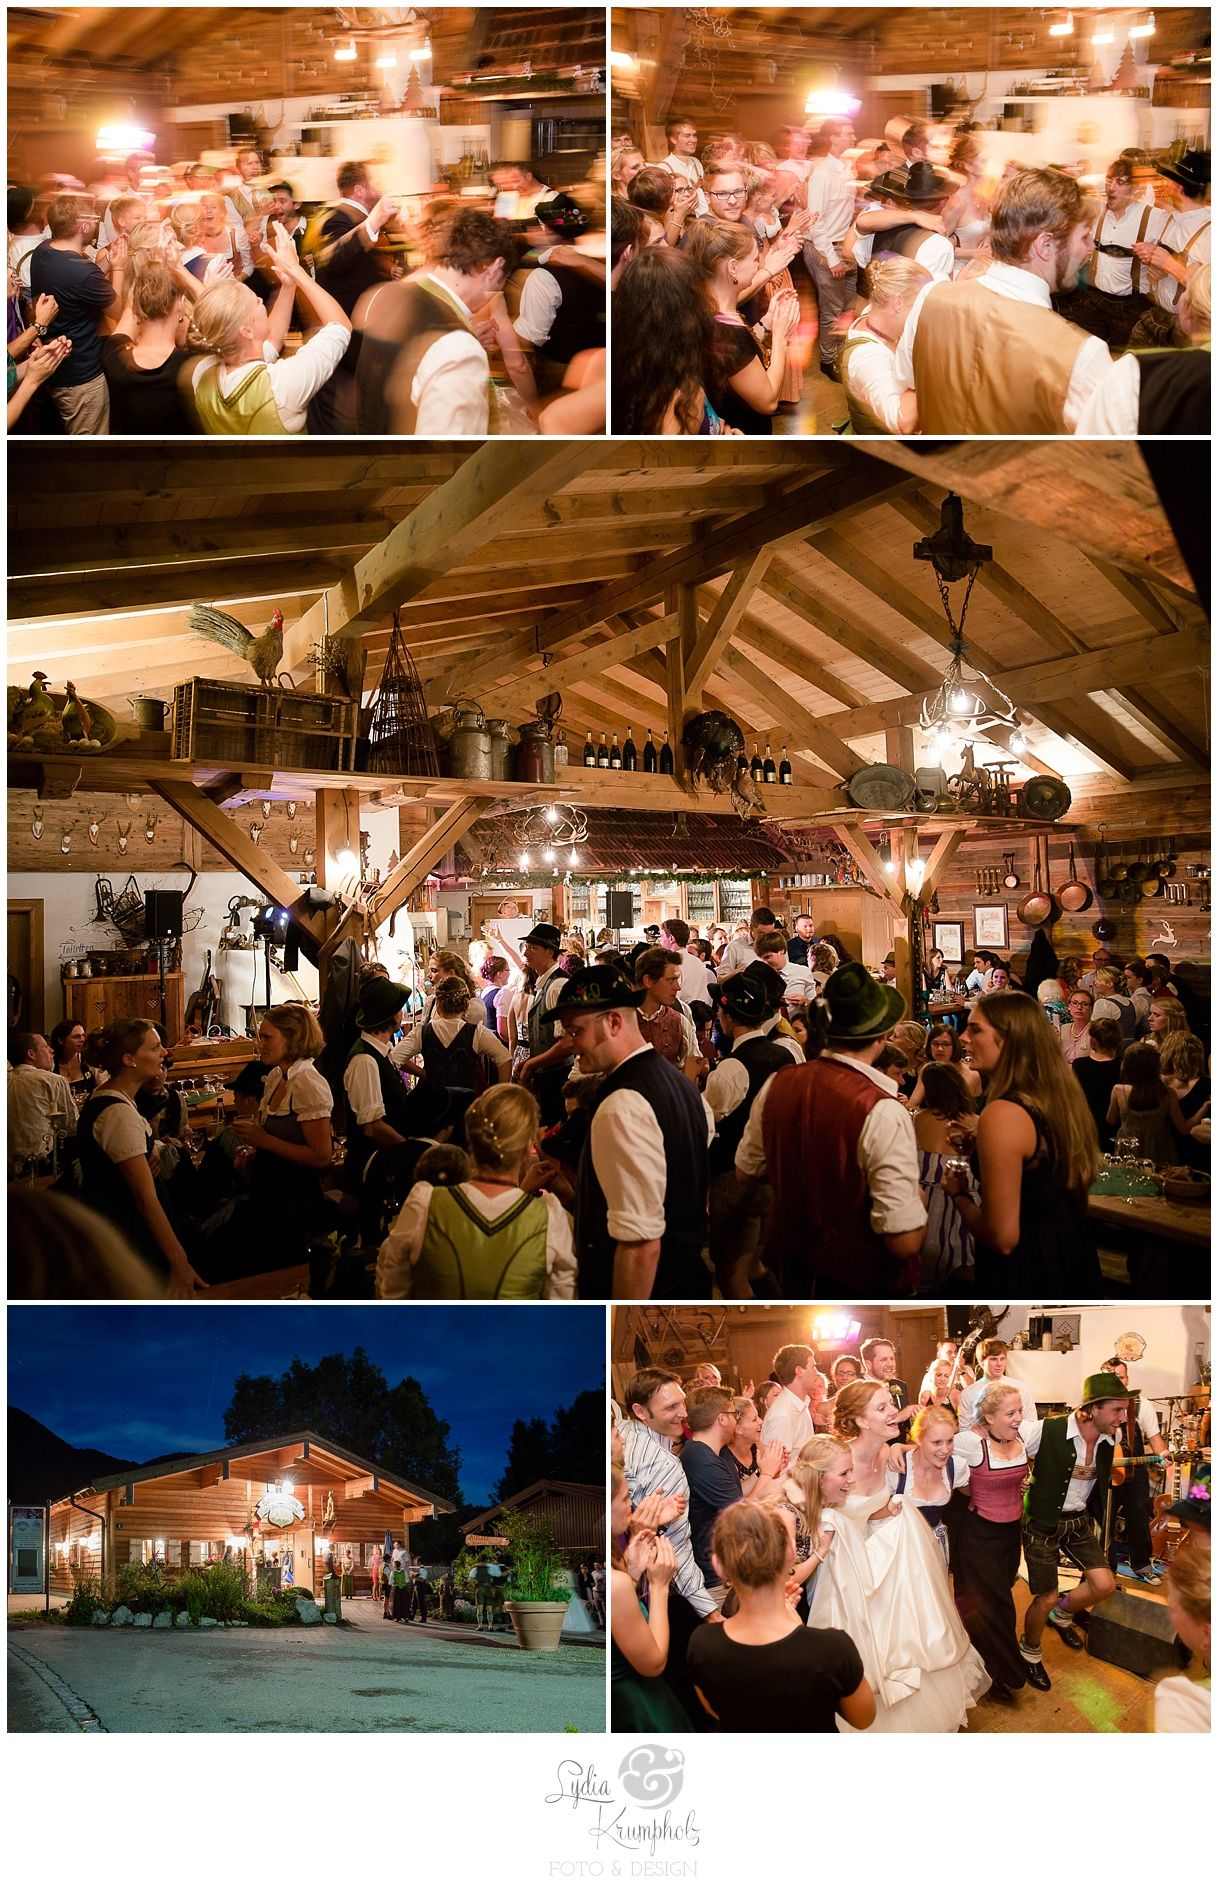 Hochzeitsfeier In Aschau Im Chiemgau Hochzeitsfotograf Fotograf